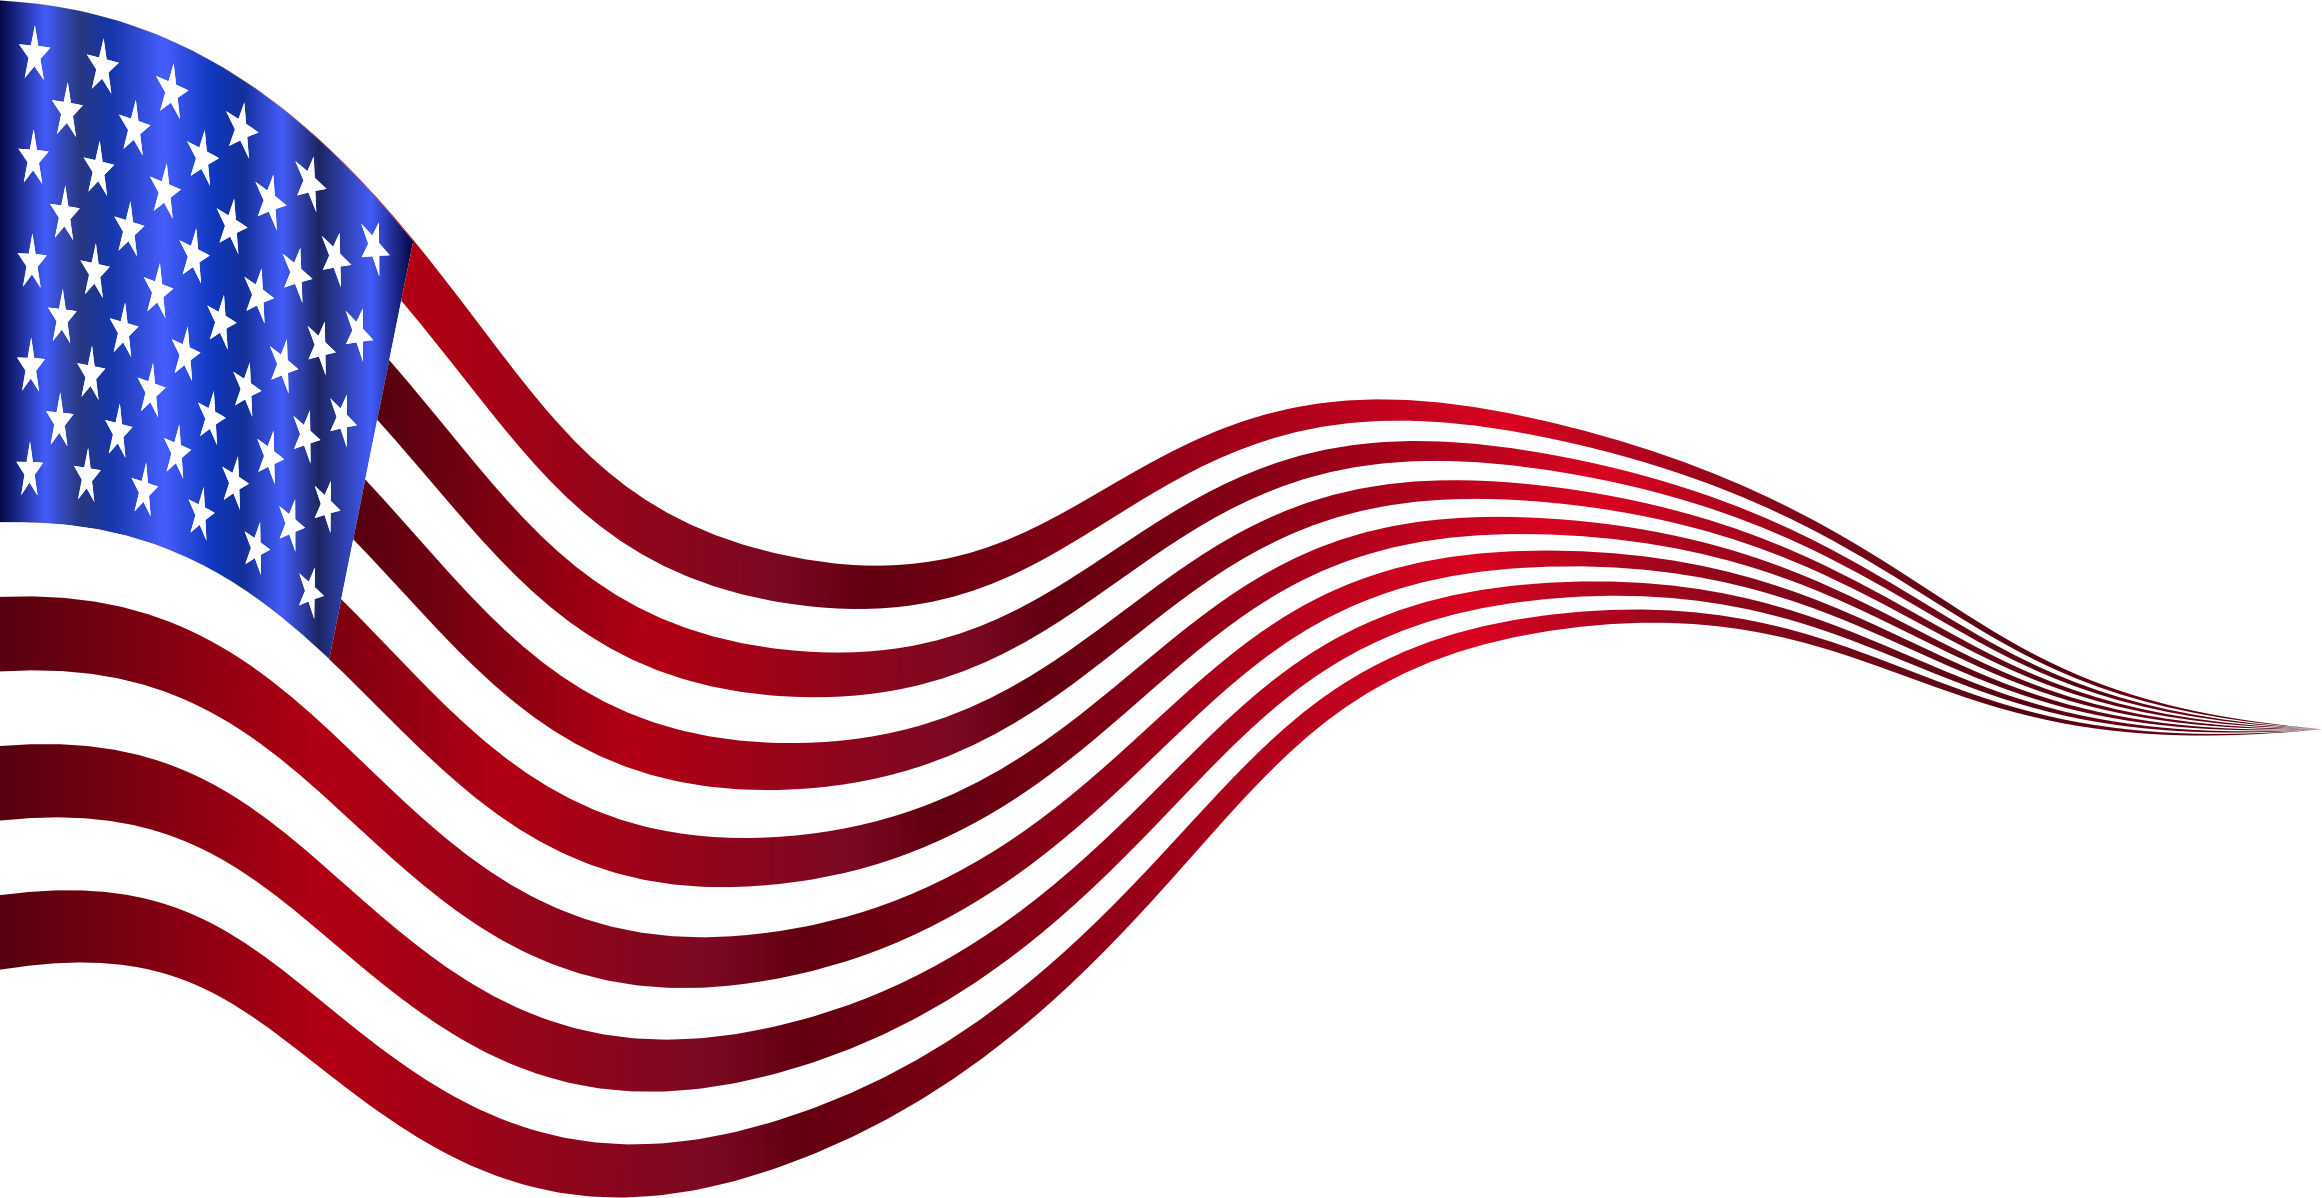 Pin By Brenda Glasier On American Flag American Flag Clip Art Flag Banners American Flag